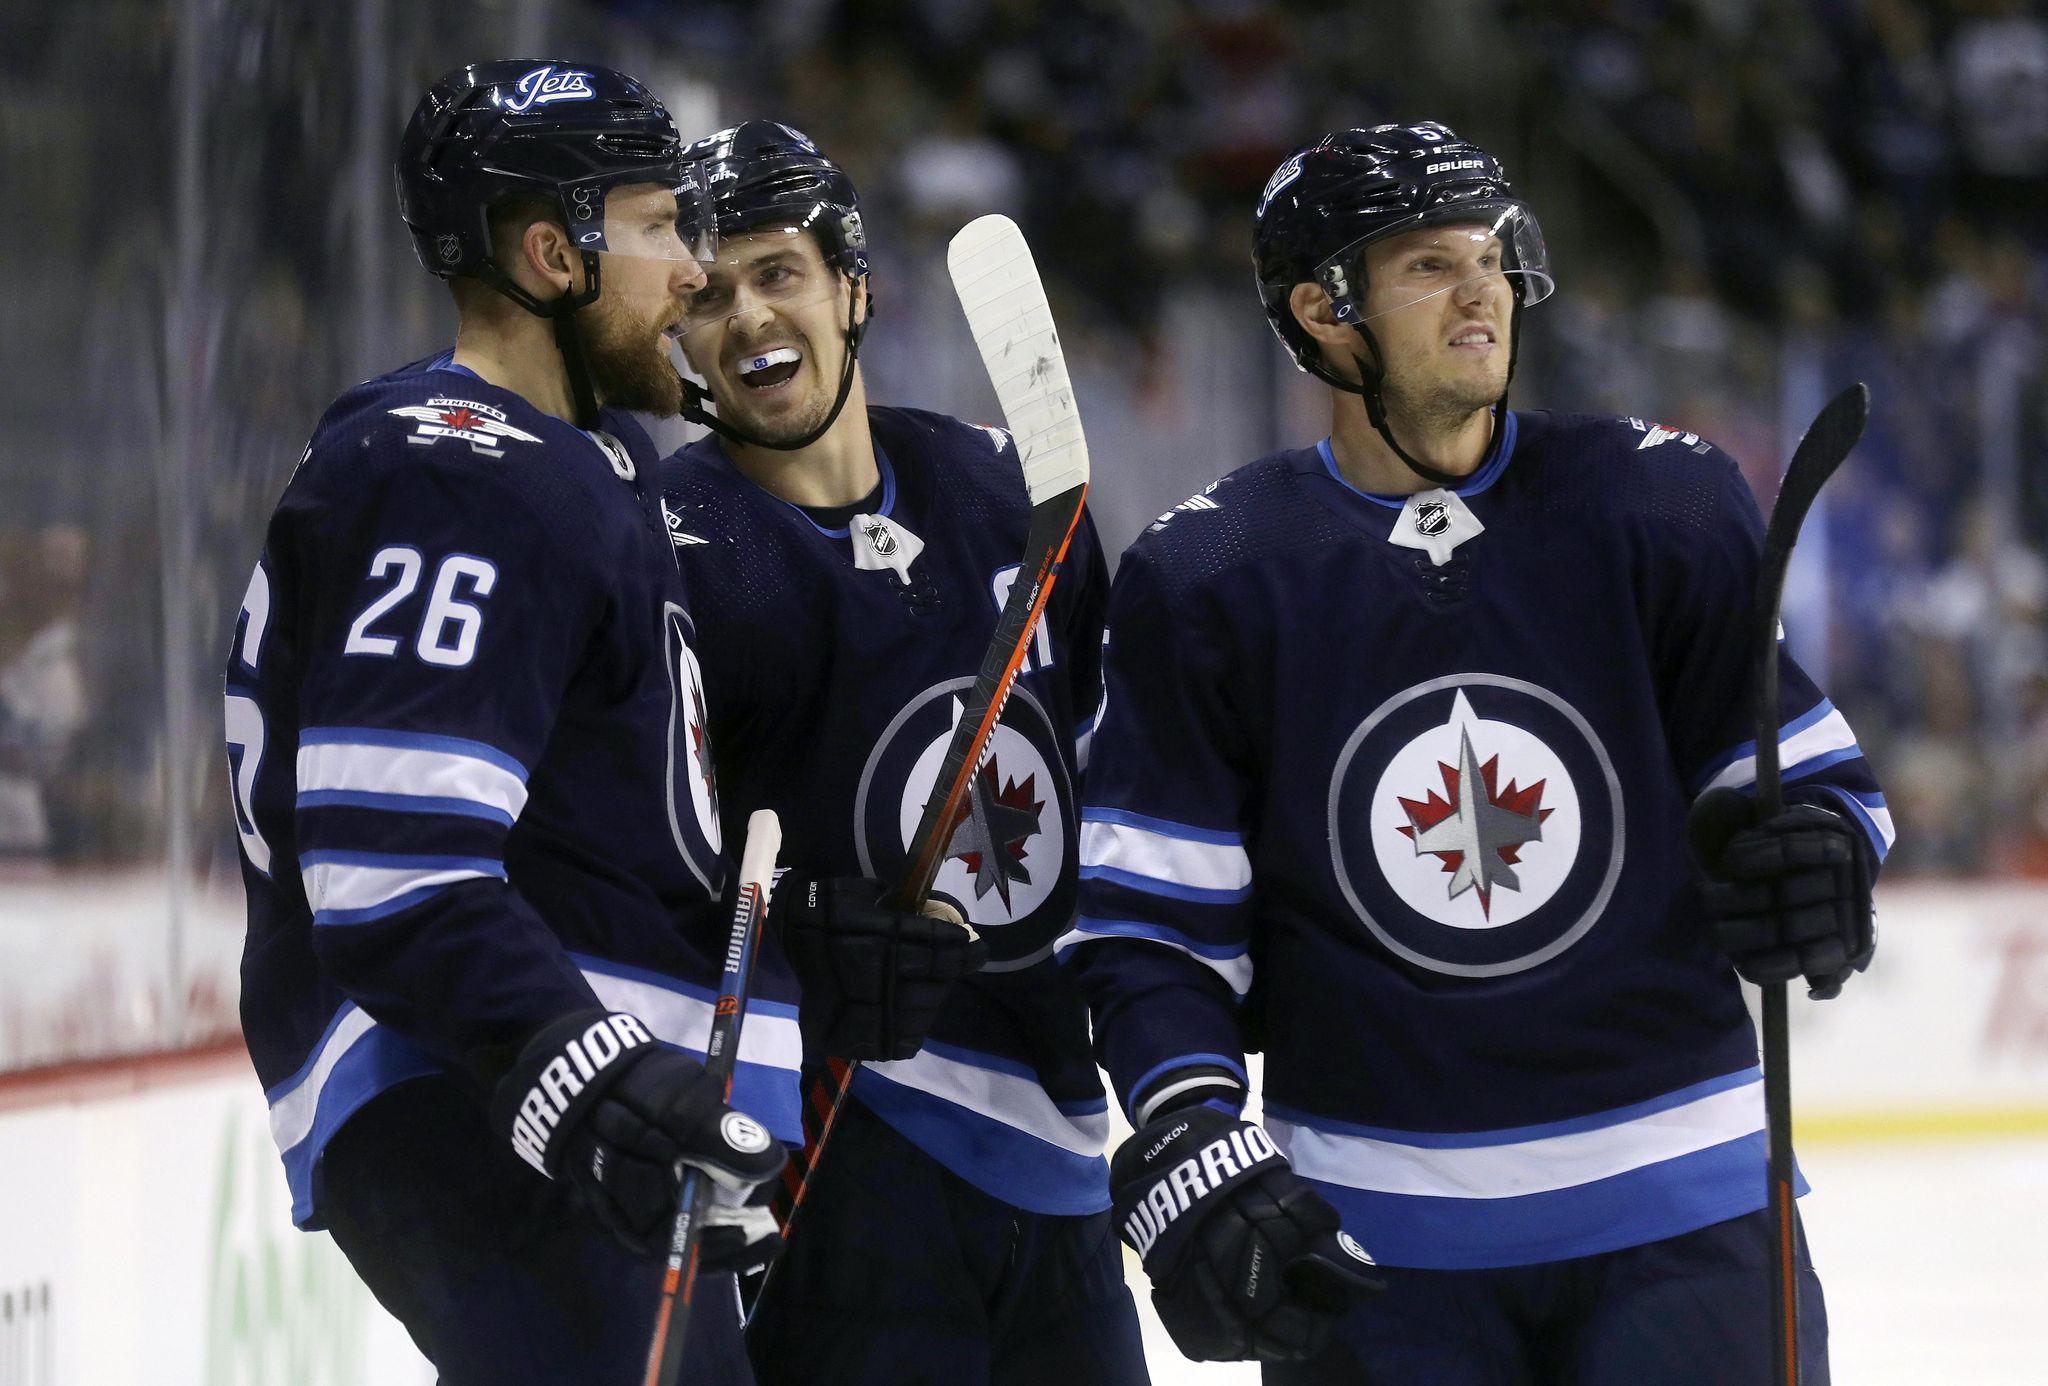 Oilers_jets_hockey_81876_s2048x1386